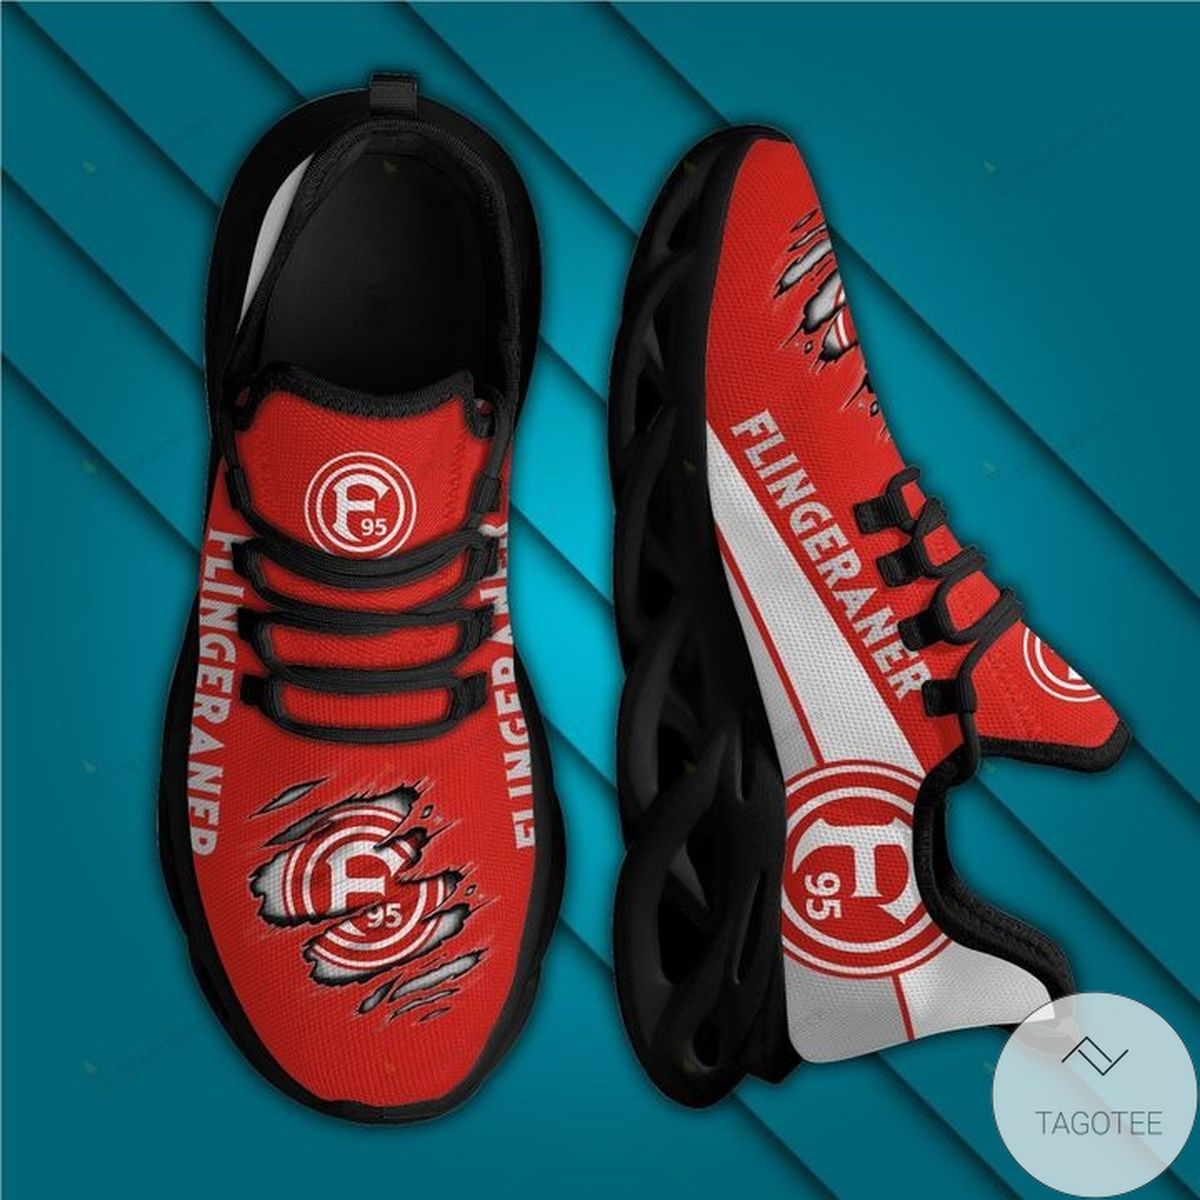 Bundesliga Borussia Mönchengladbach F95 Max Soul Shoes z